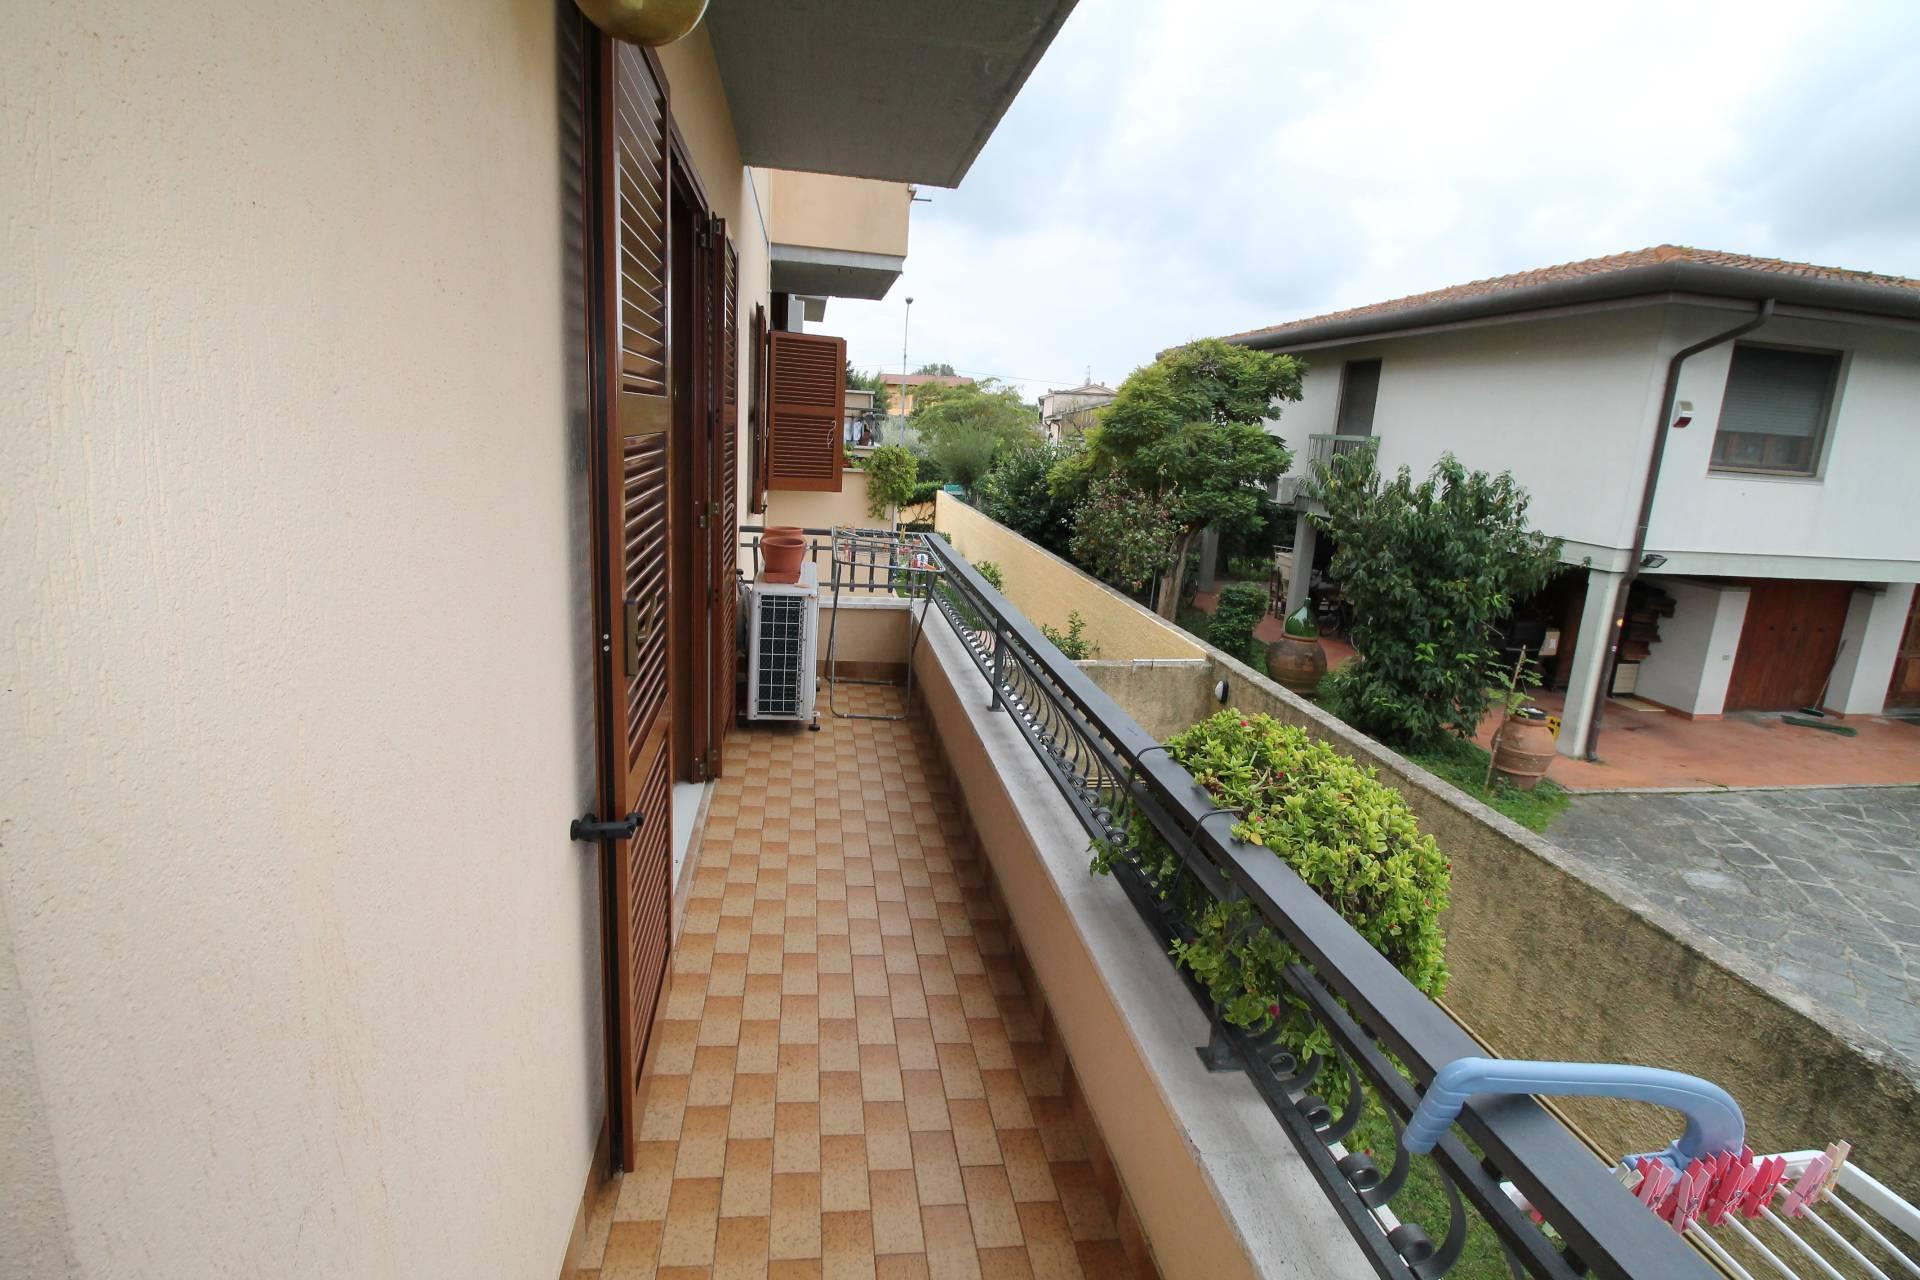 Appartamento in vendita, rif. V2790B